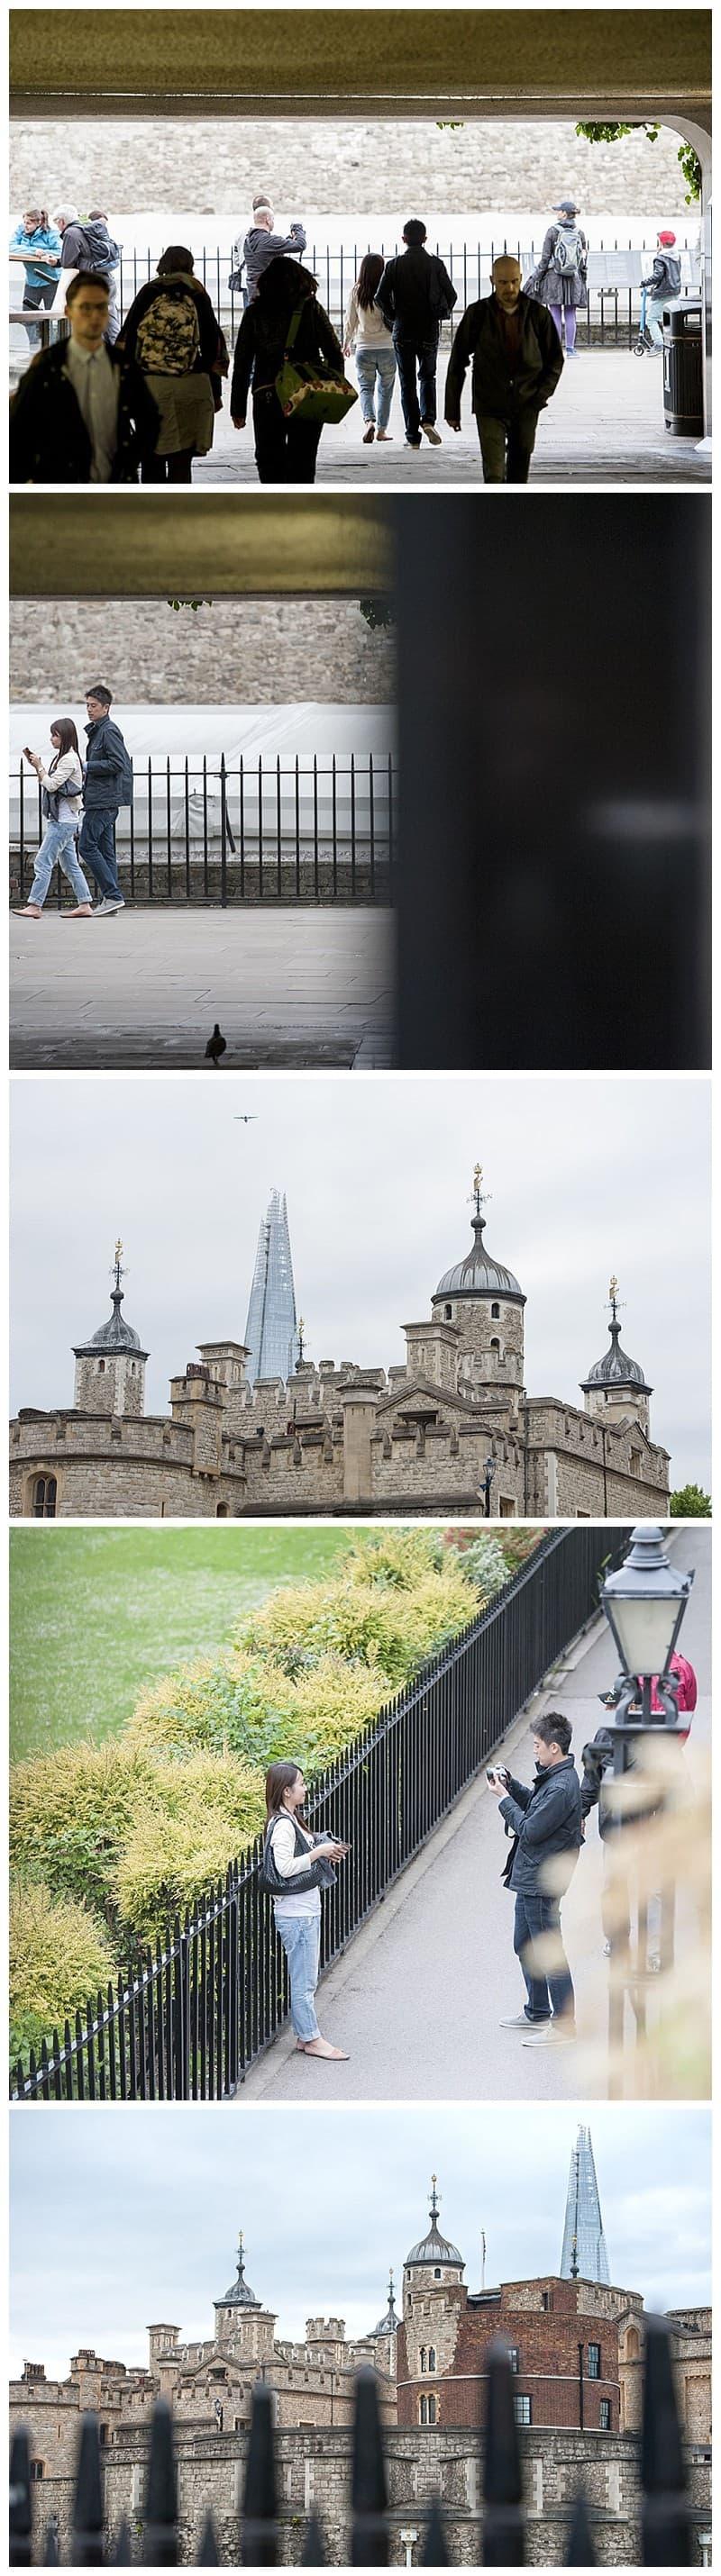 Kyle & Mandy Engagement Photoshoot, Tower Bridge, London, Benjamin Wetherall Photography0002